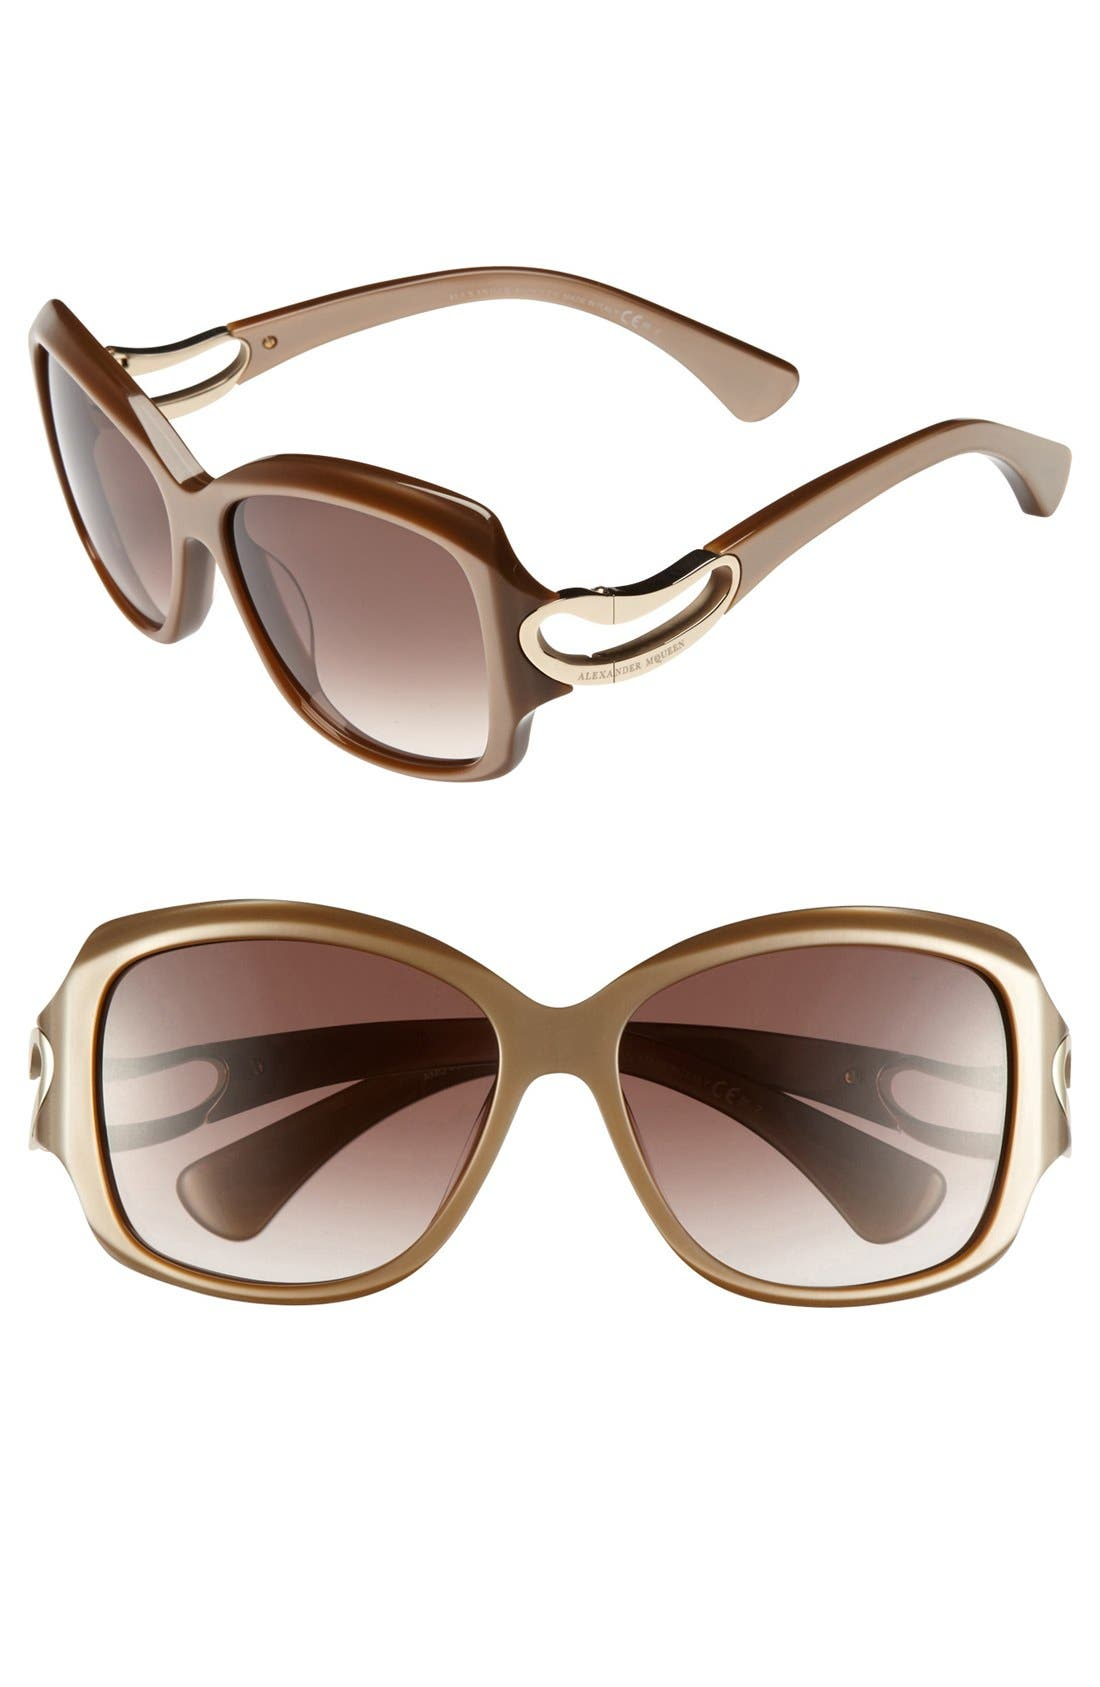 Main Image - Alexander McQueen 56mm Retro Sunglasses